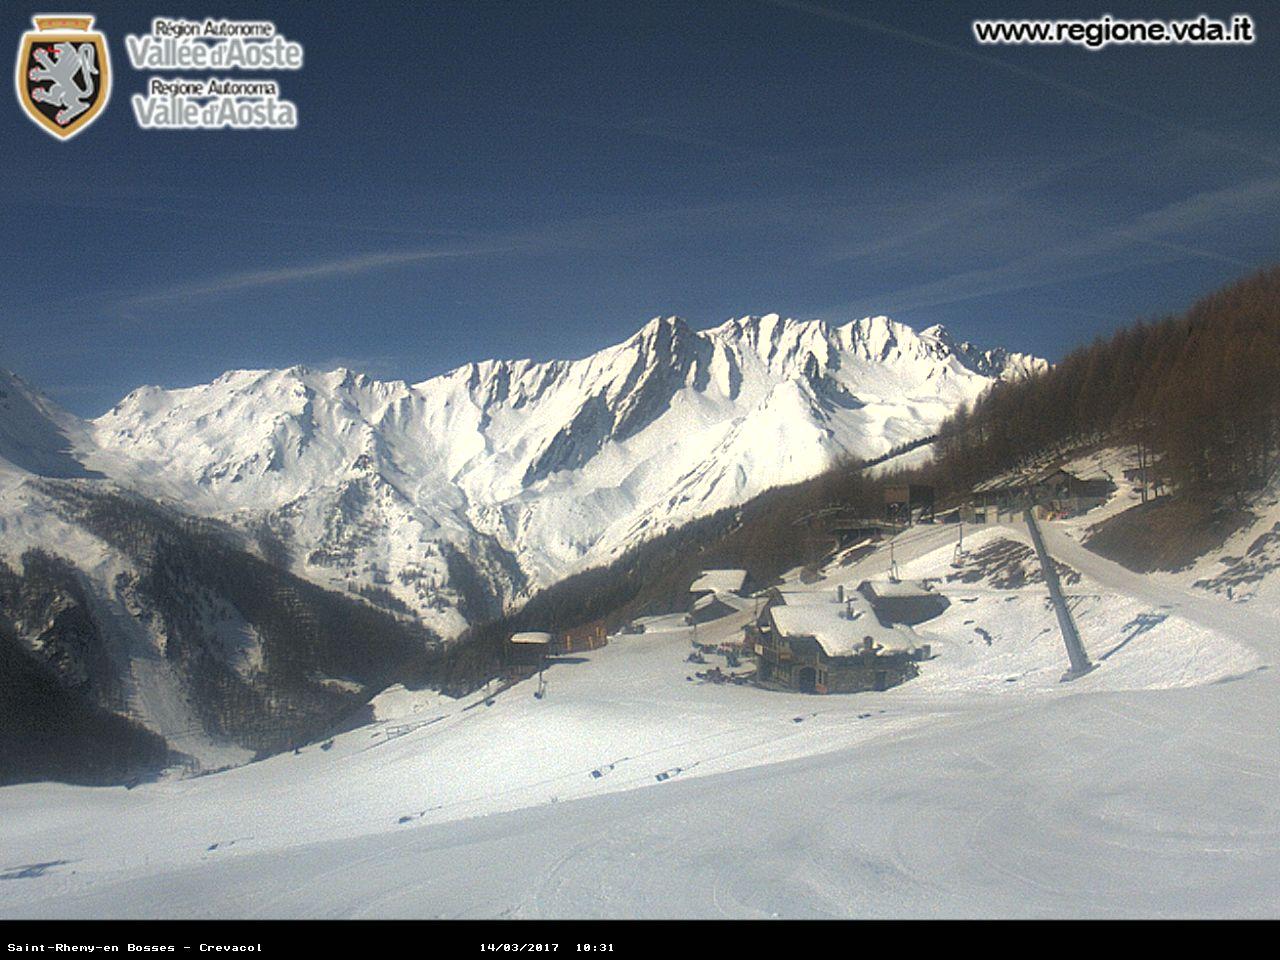 Romagna dal 13 al 19 marzo 2017-crevacol.jpg